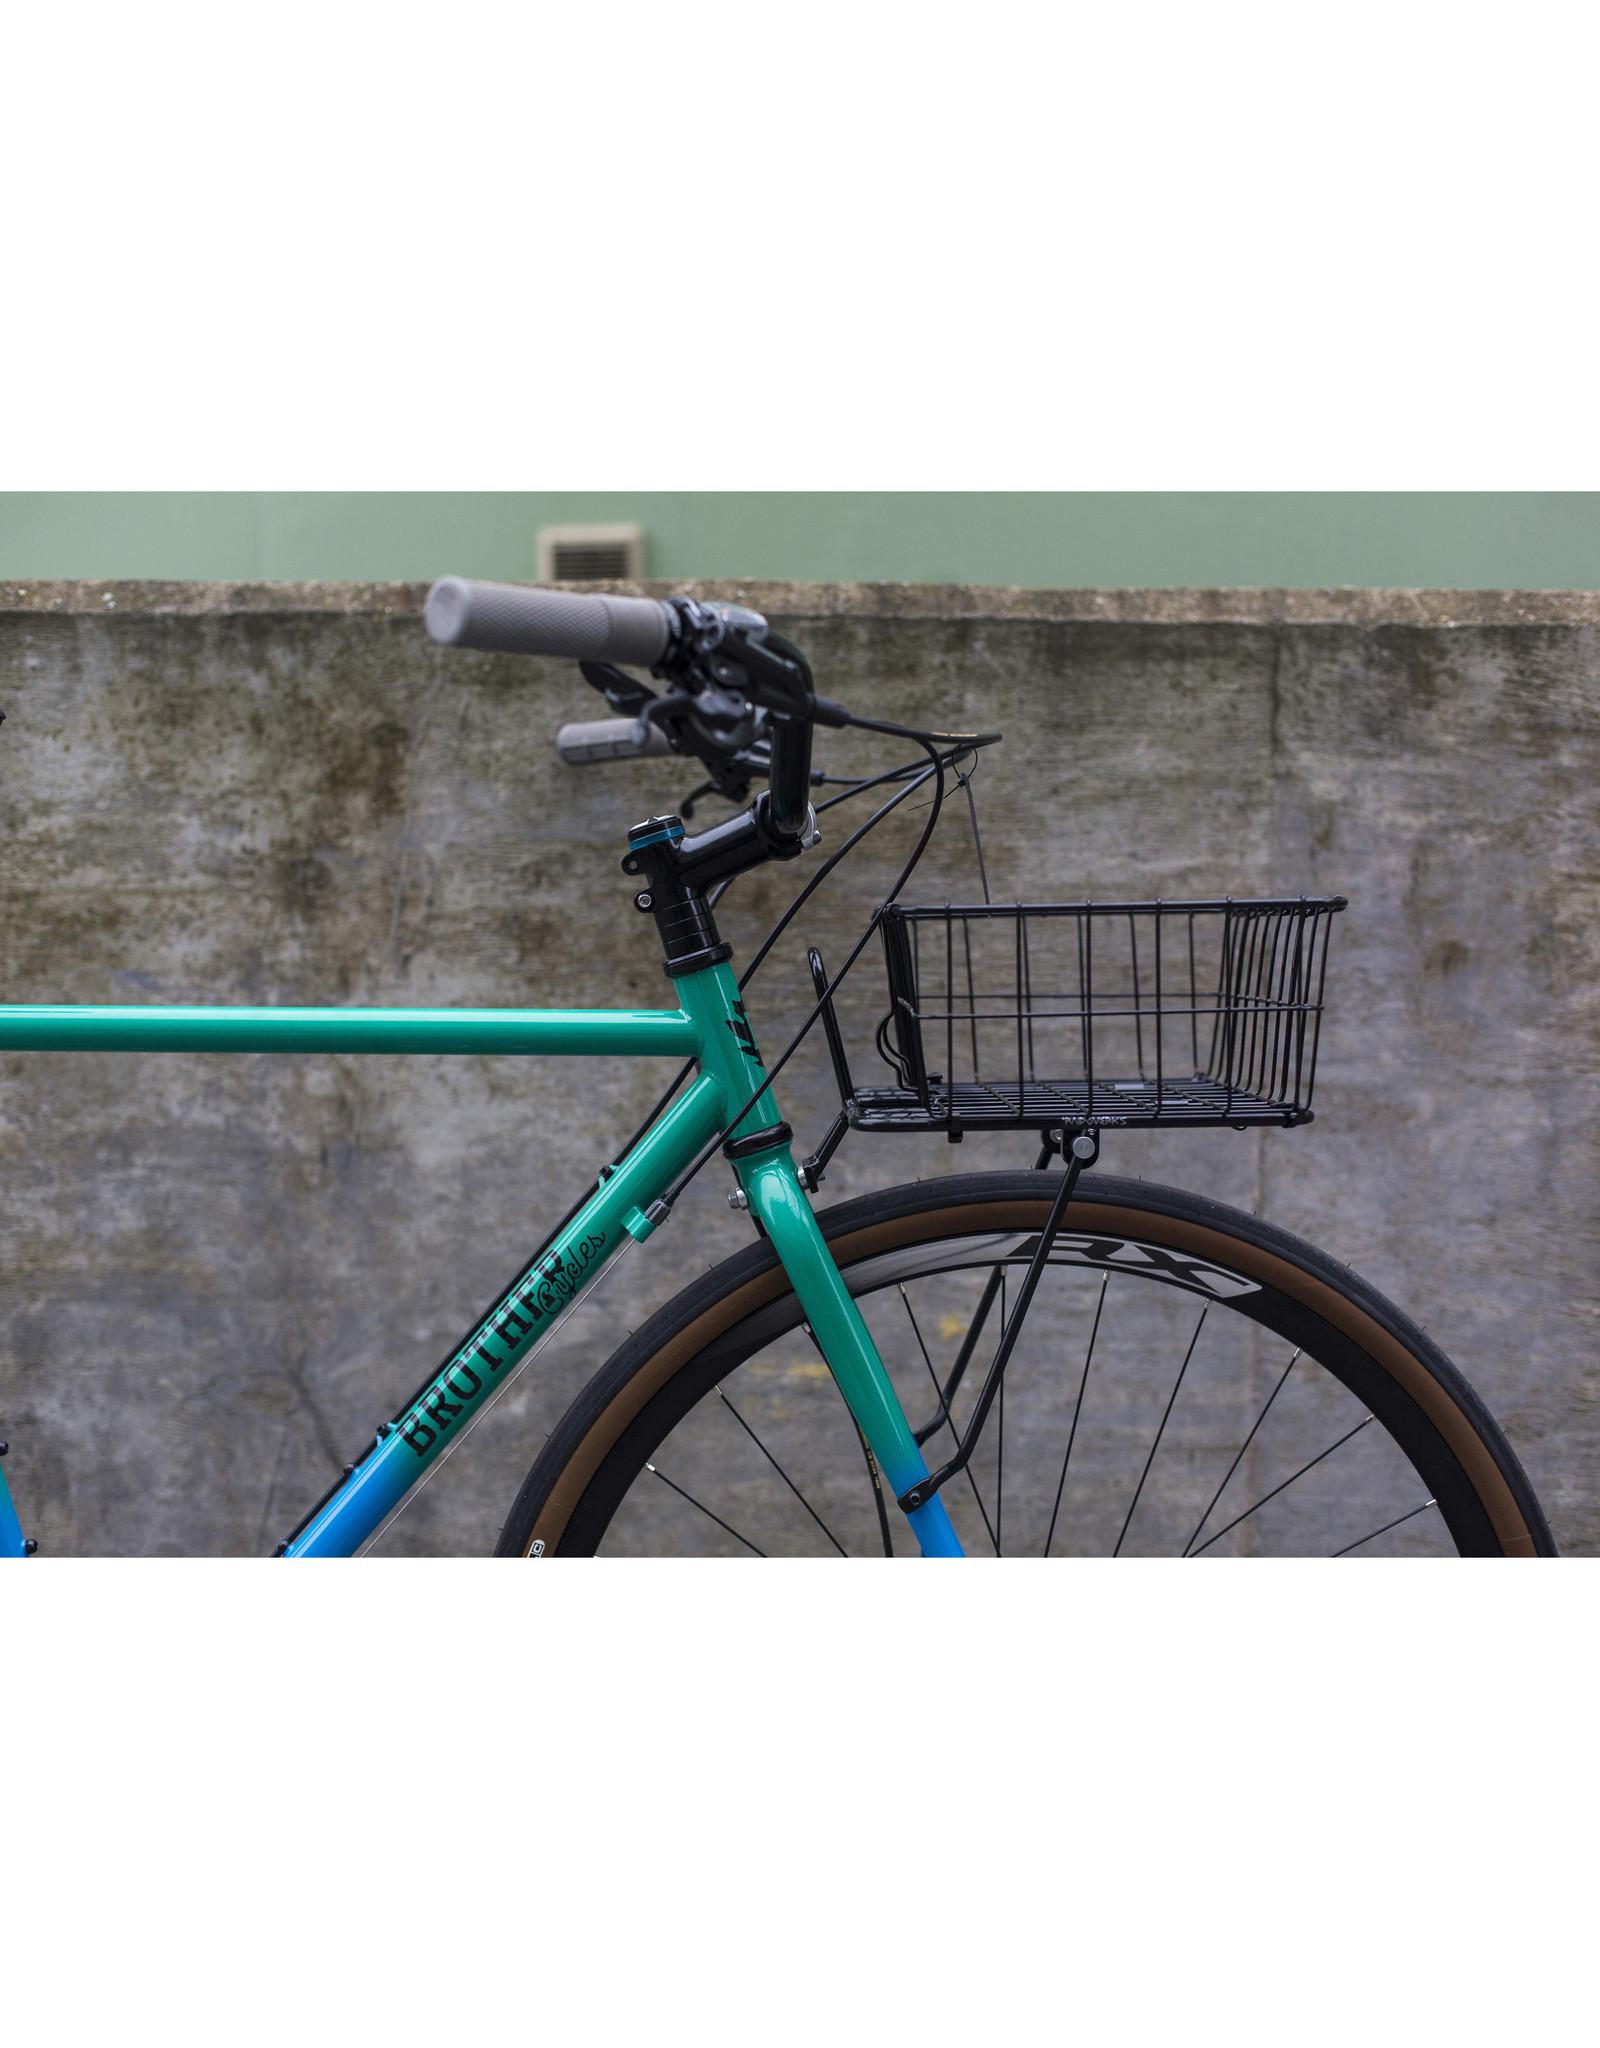 Seabass Cycles Brother Cycles - Kepler Disc Blue / Green Aqua Fade - Custom Build